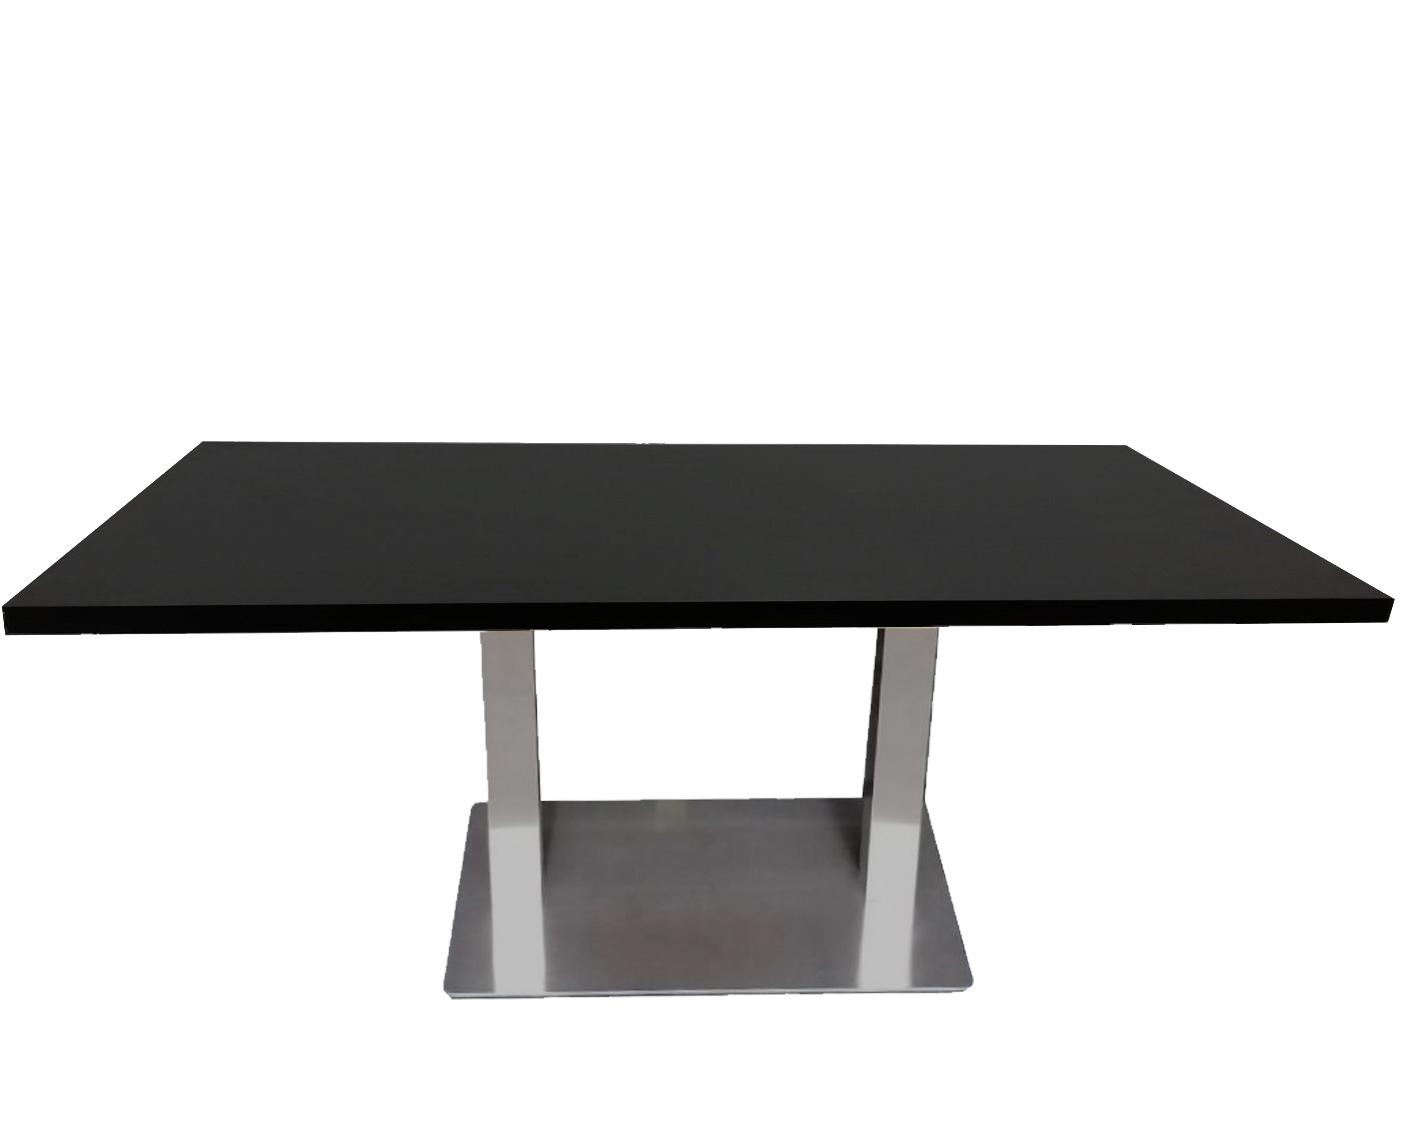 Polar black Dining table_091018